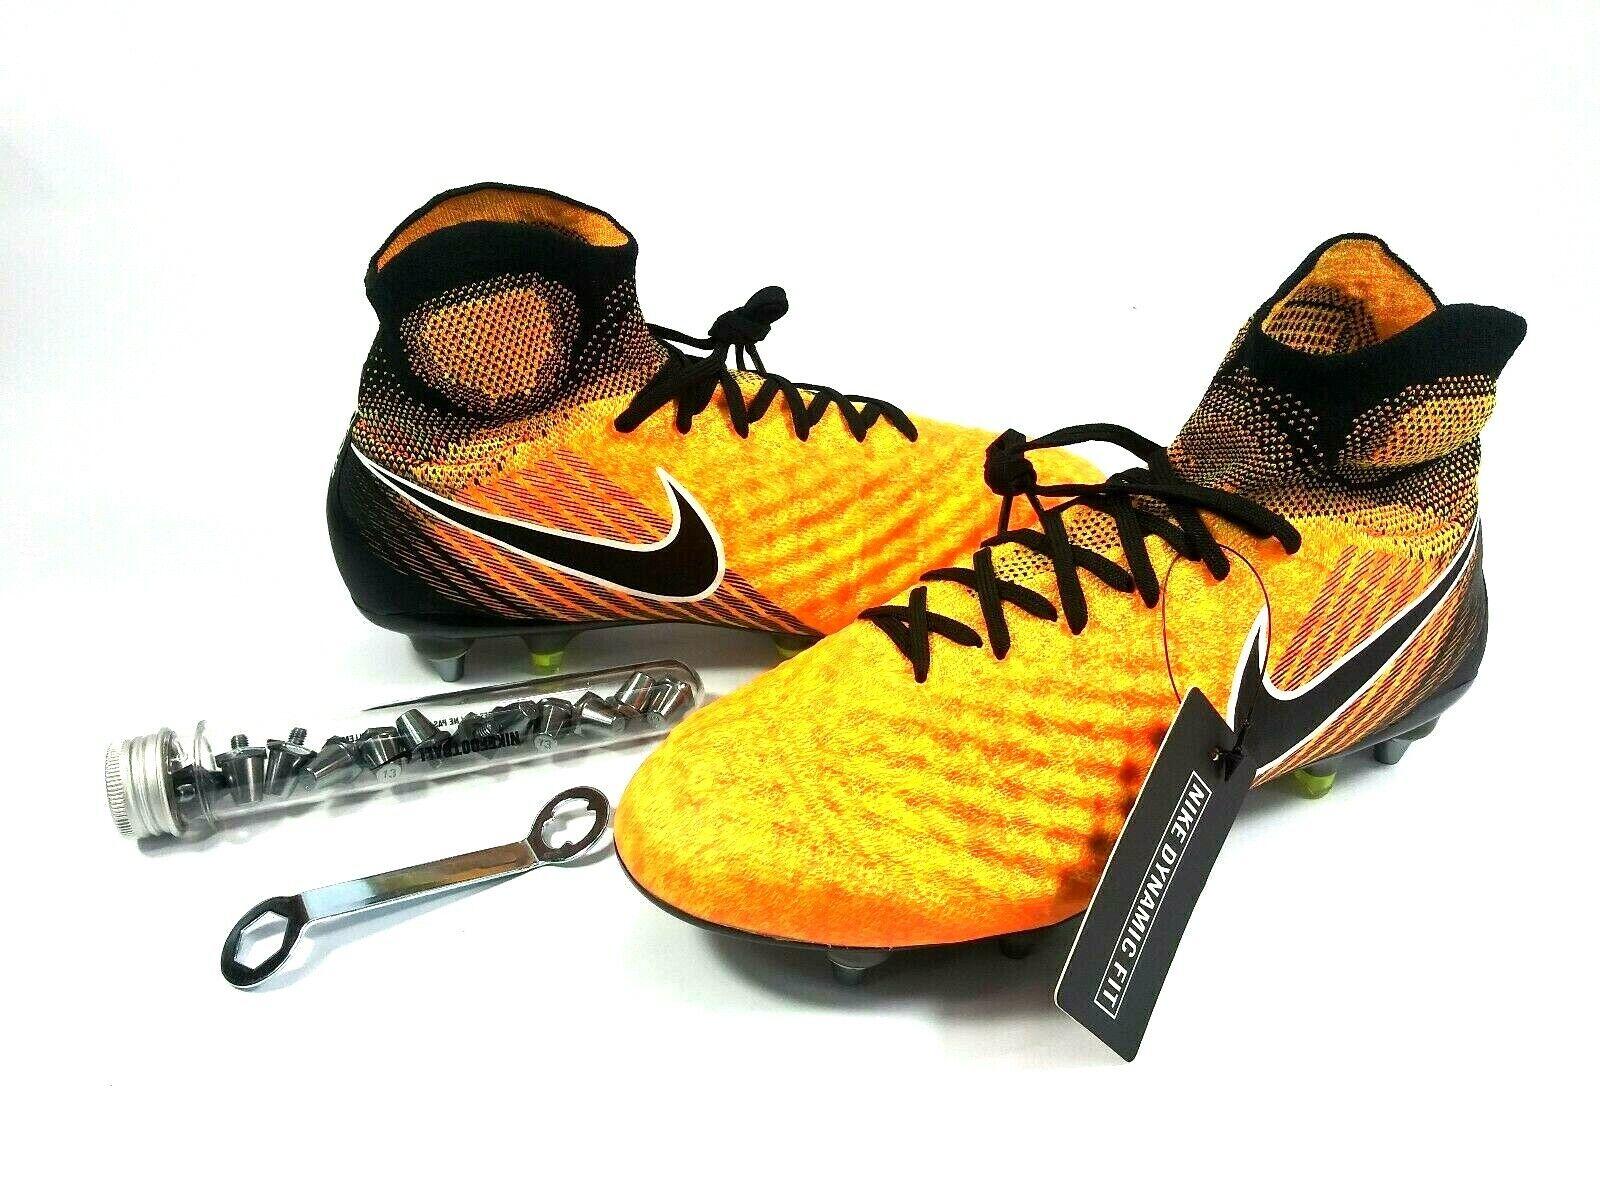 Nike Magista Obra Ii Sg-pro Botines De Fútbol Flyknit Acc tamaño 7 844596-802 A1512M